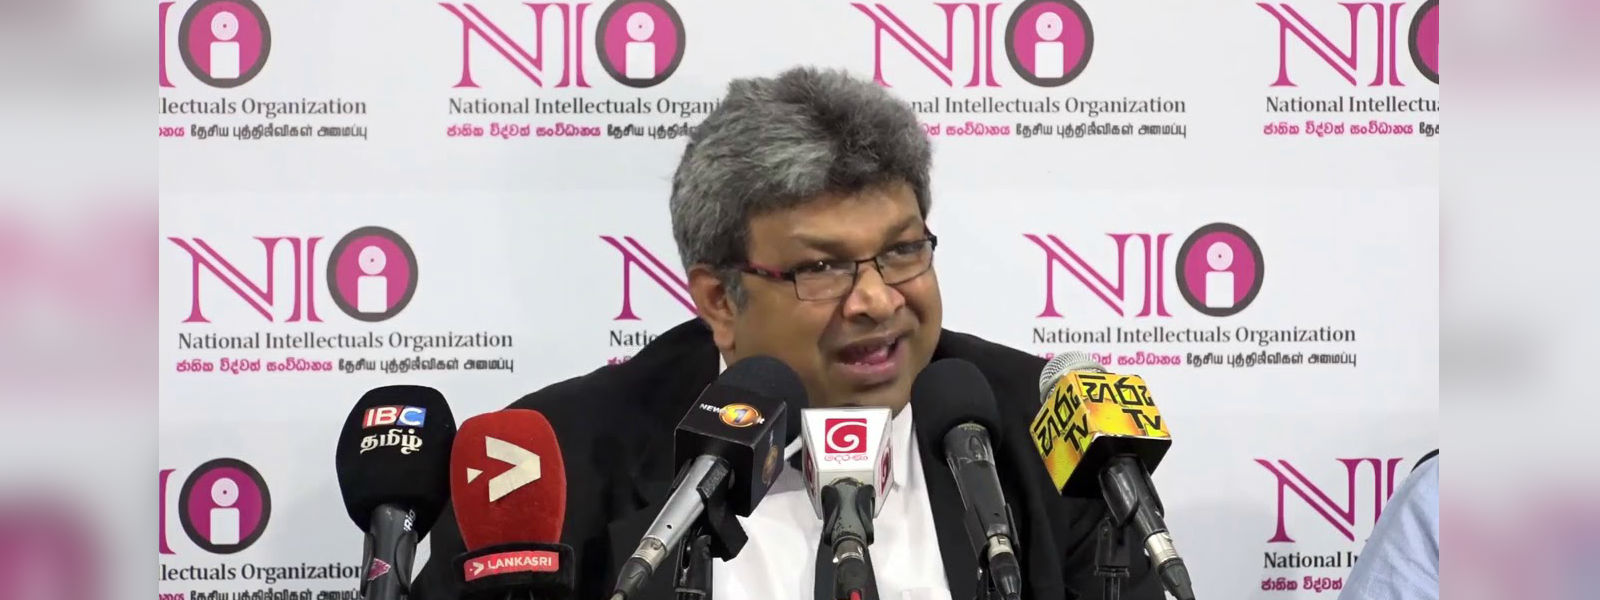 Religious disharmony is the final resort of thugs: Harshana Nanayakkara